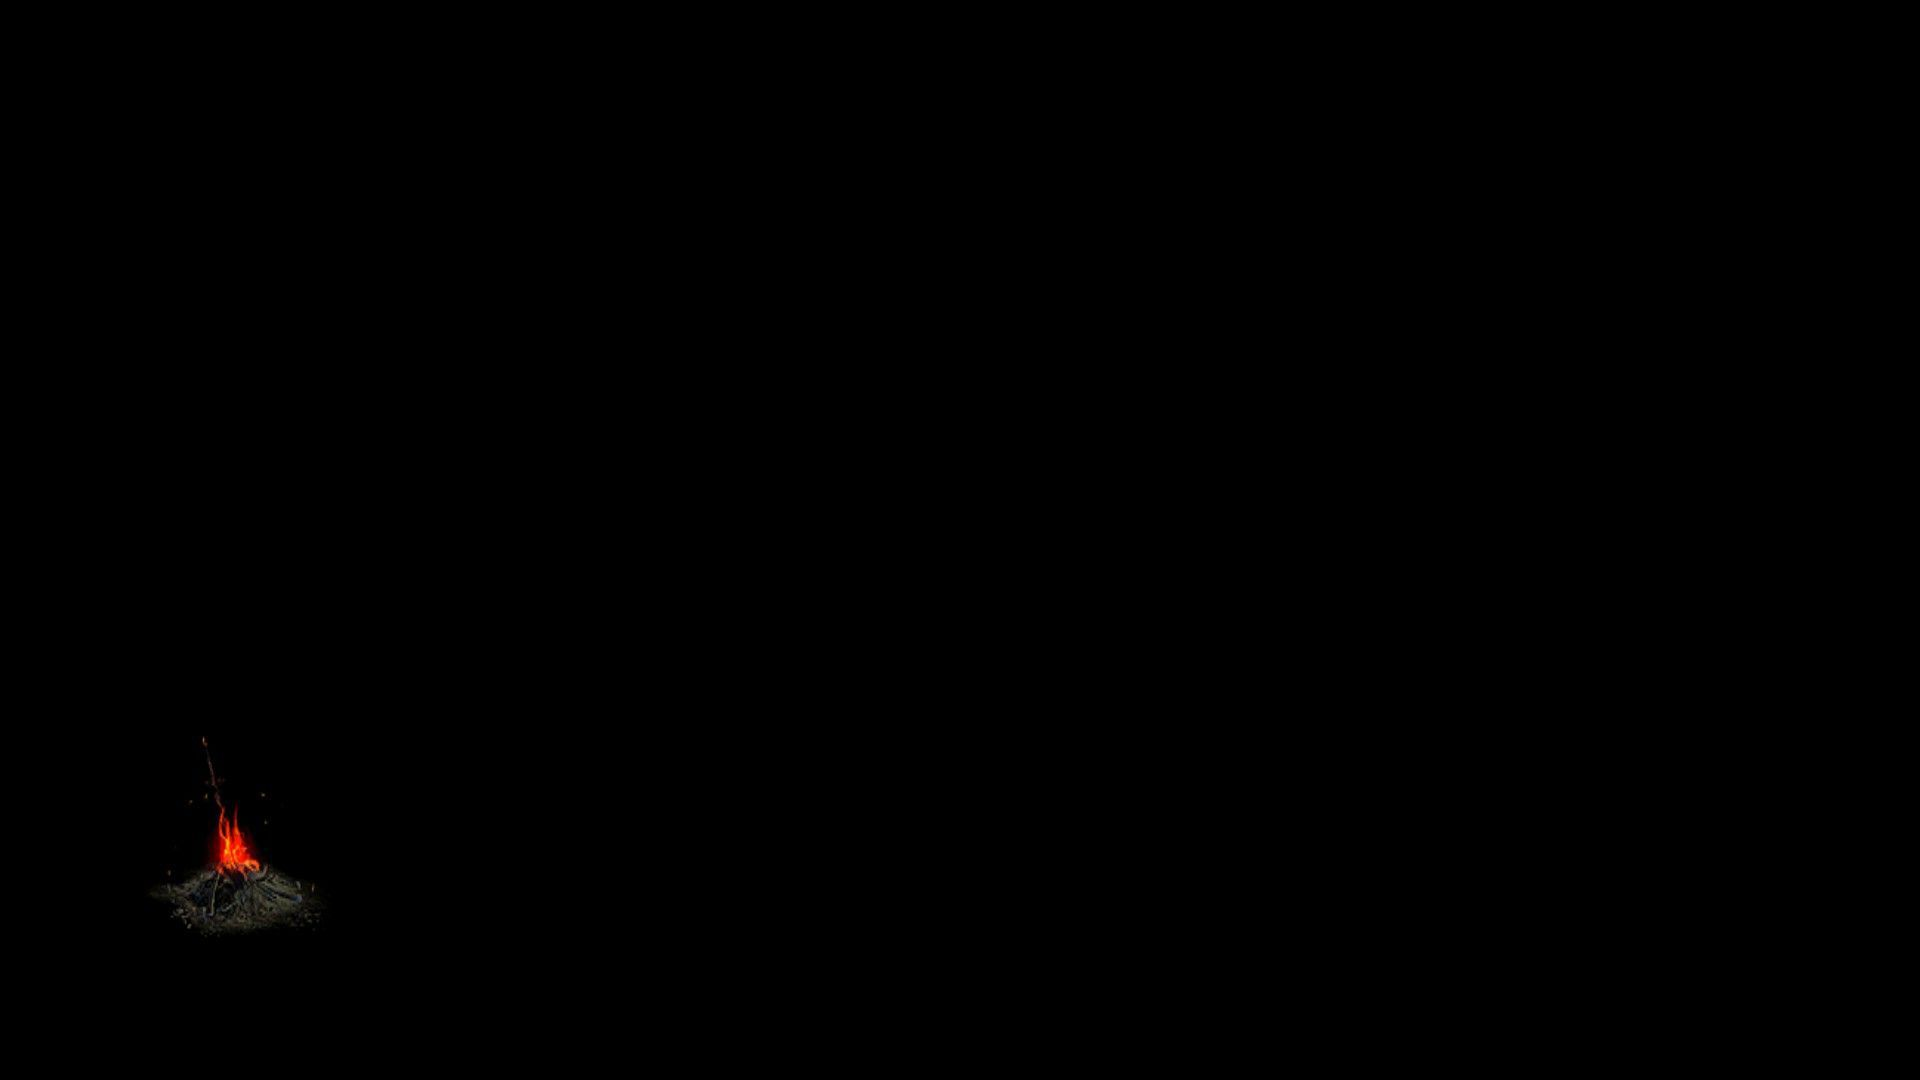 Minimalist Dark Souls Wallpapers Top Free Minimalist Dark Souls Backgrounds Wallpaperaccess